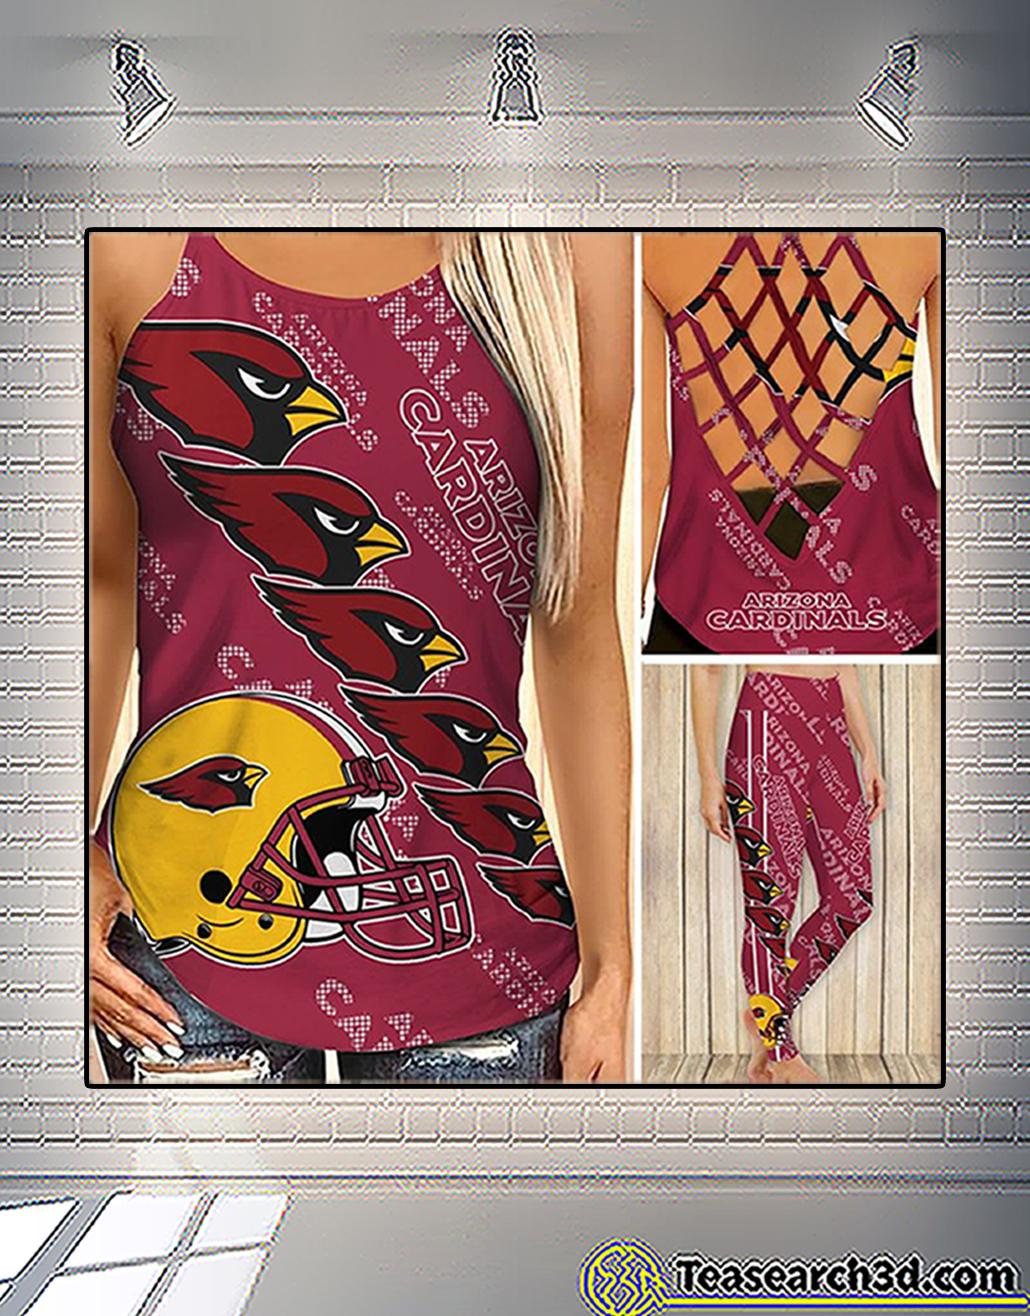 Arizona cardinals criss cross tank top and leggings